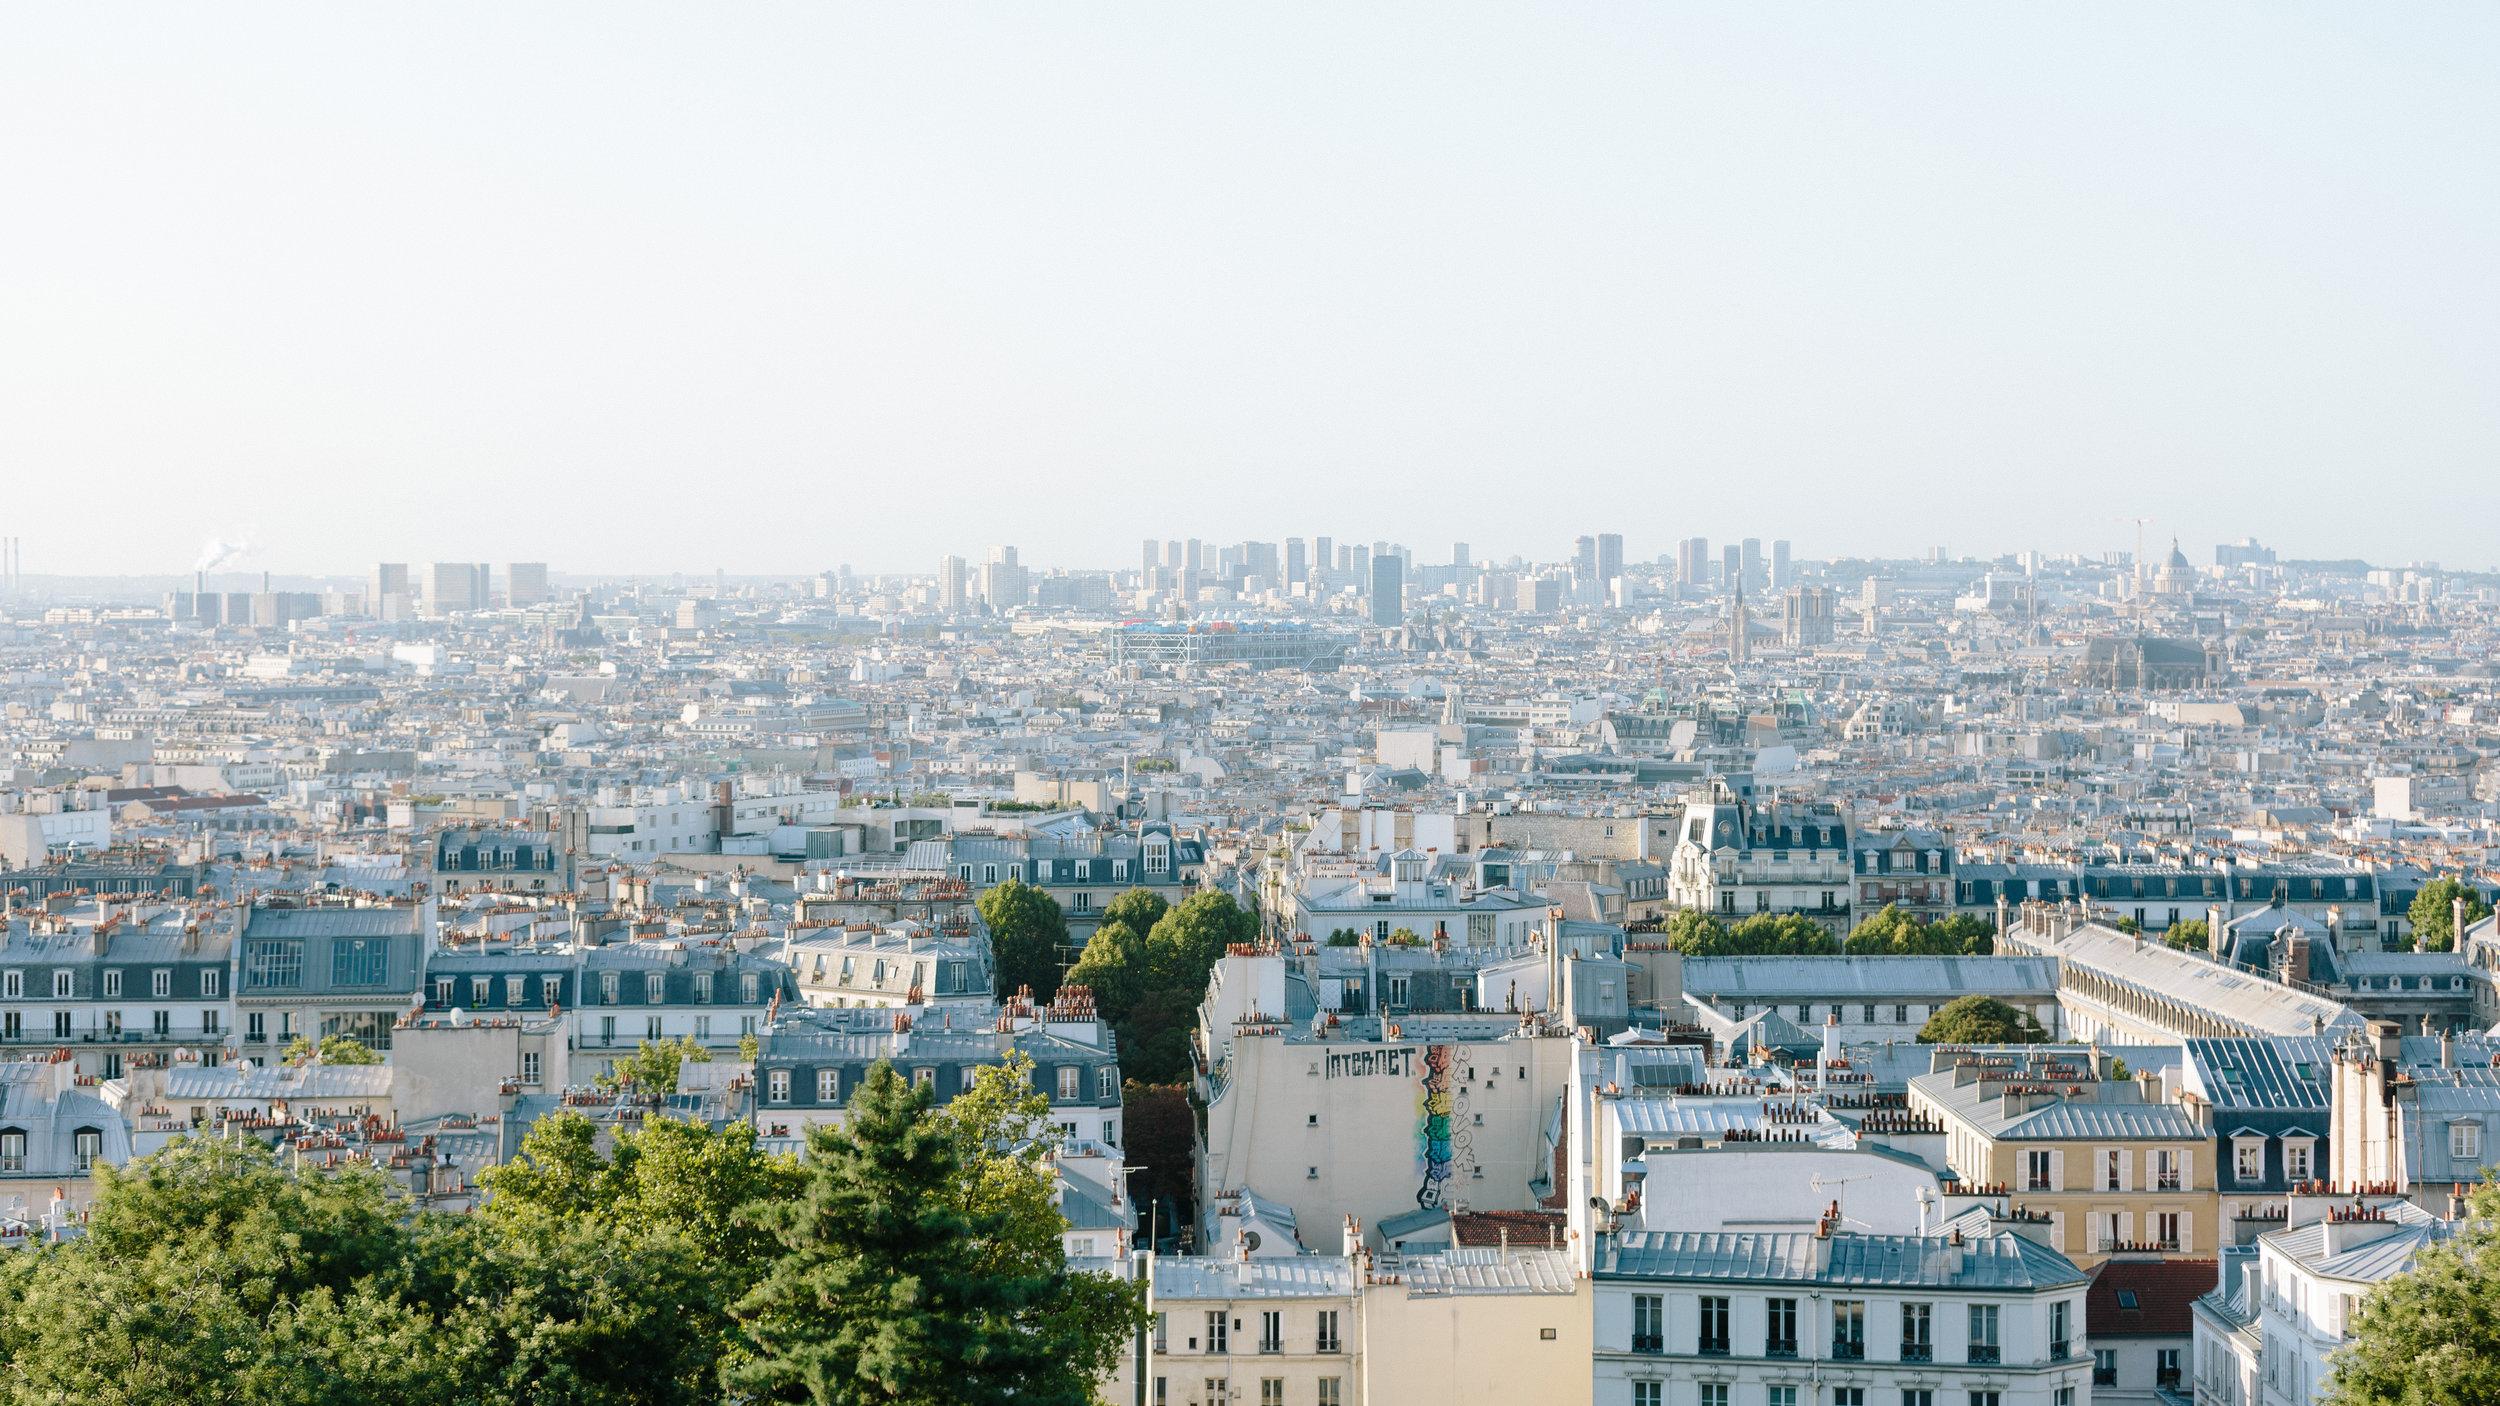 Montmartre view of Parisian rooftops by Paris Photographer Federico Guendel